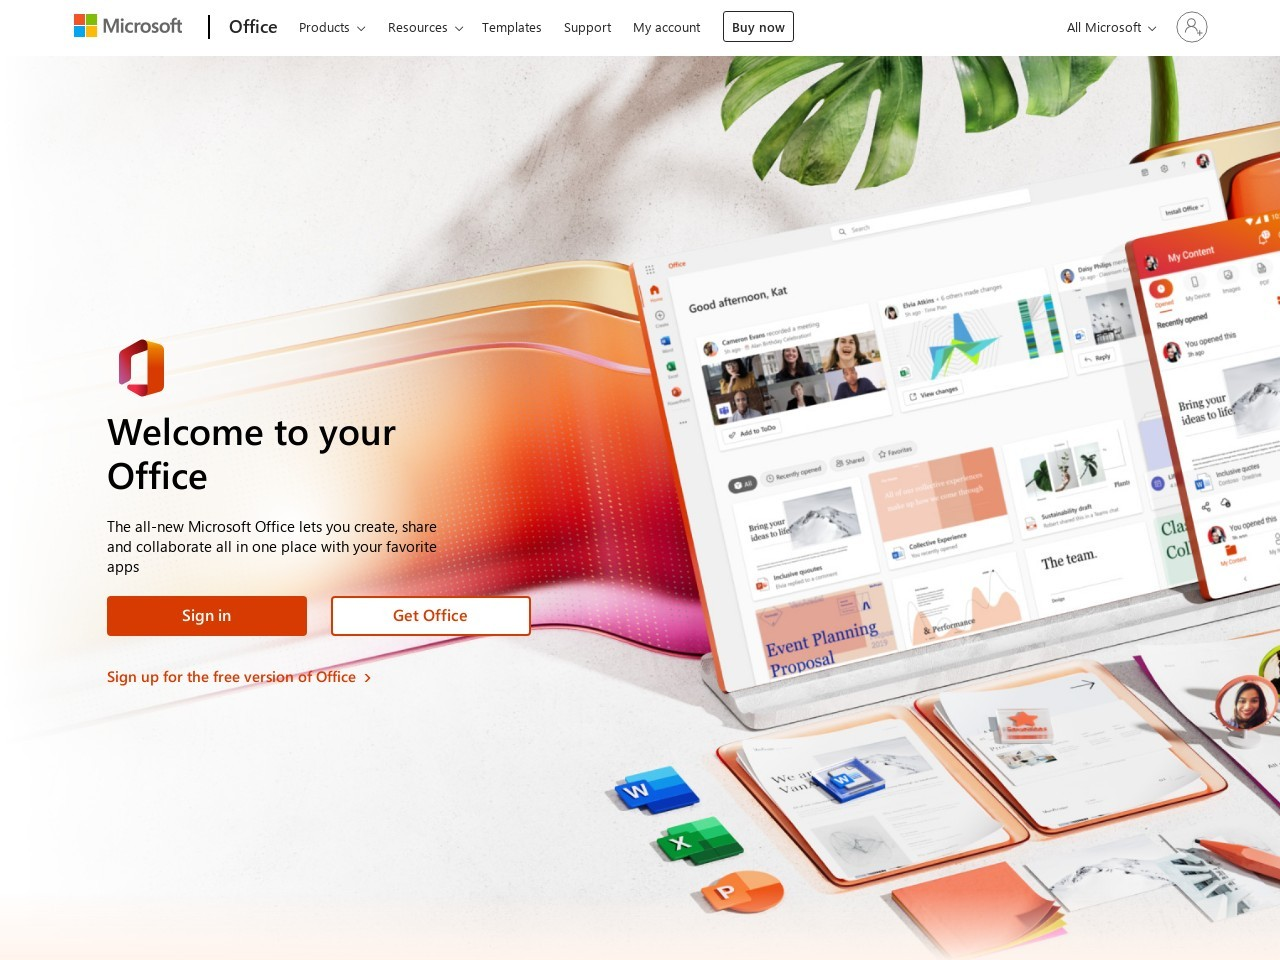 Inicio de sesión de Office 365 | Microsoft Office